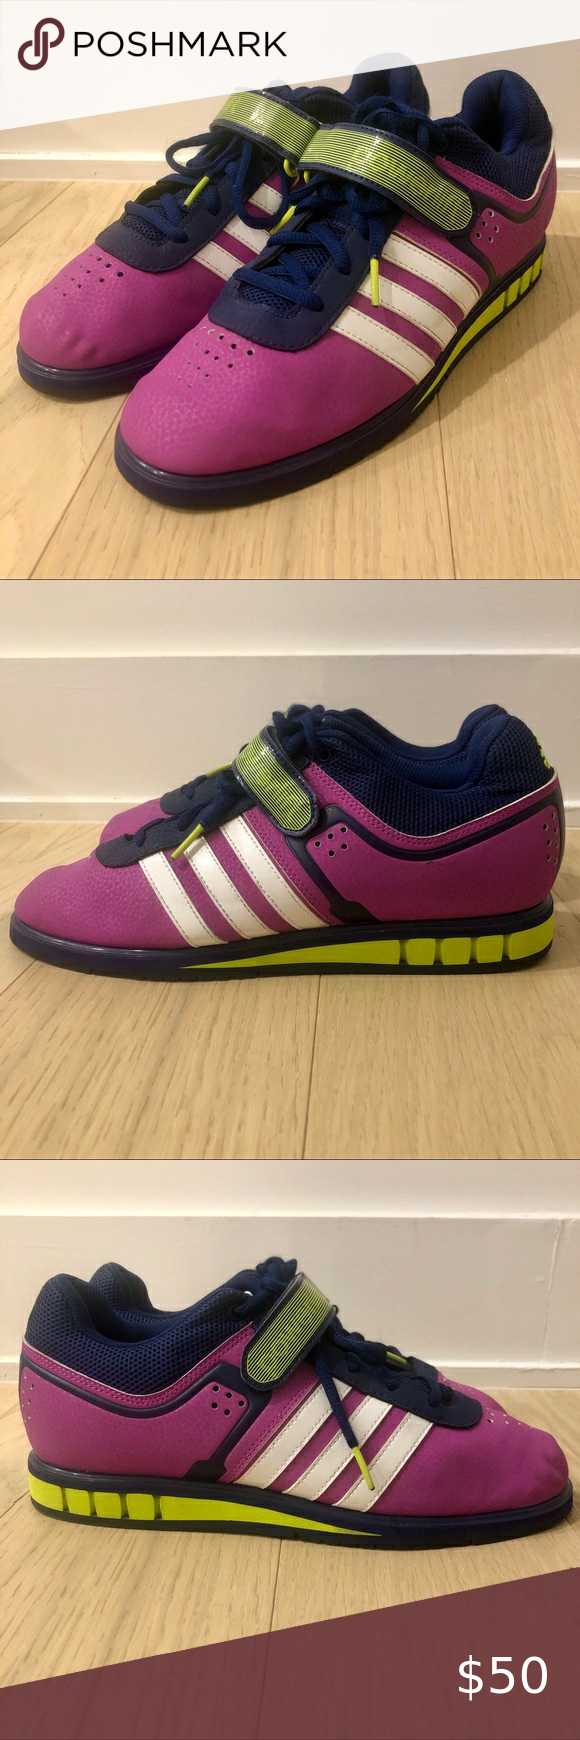 Photo of Adidas PowerLift 2.0 | Flash Pink Adidas PowerLift 2.0 weightlifting sneaker in …